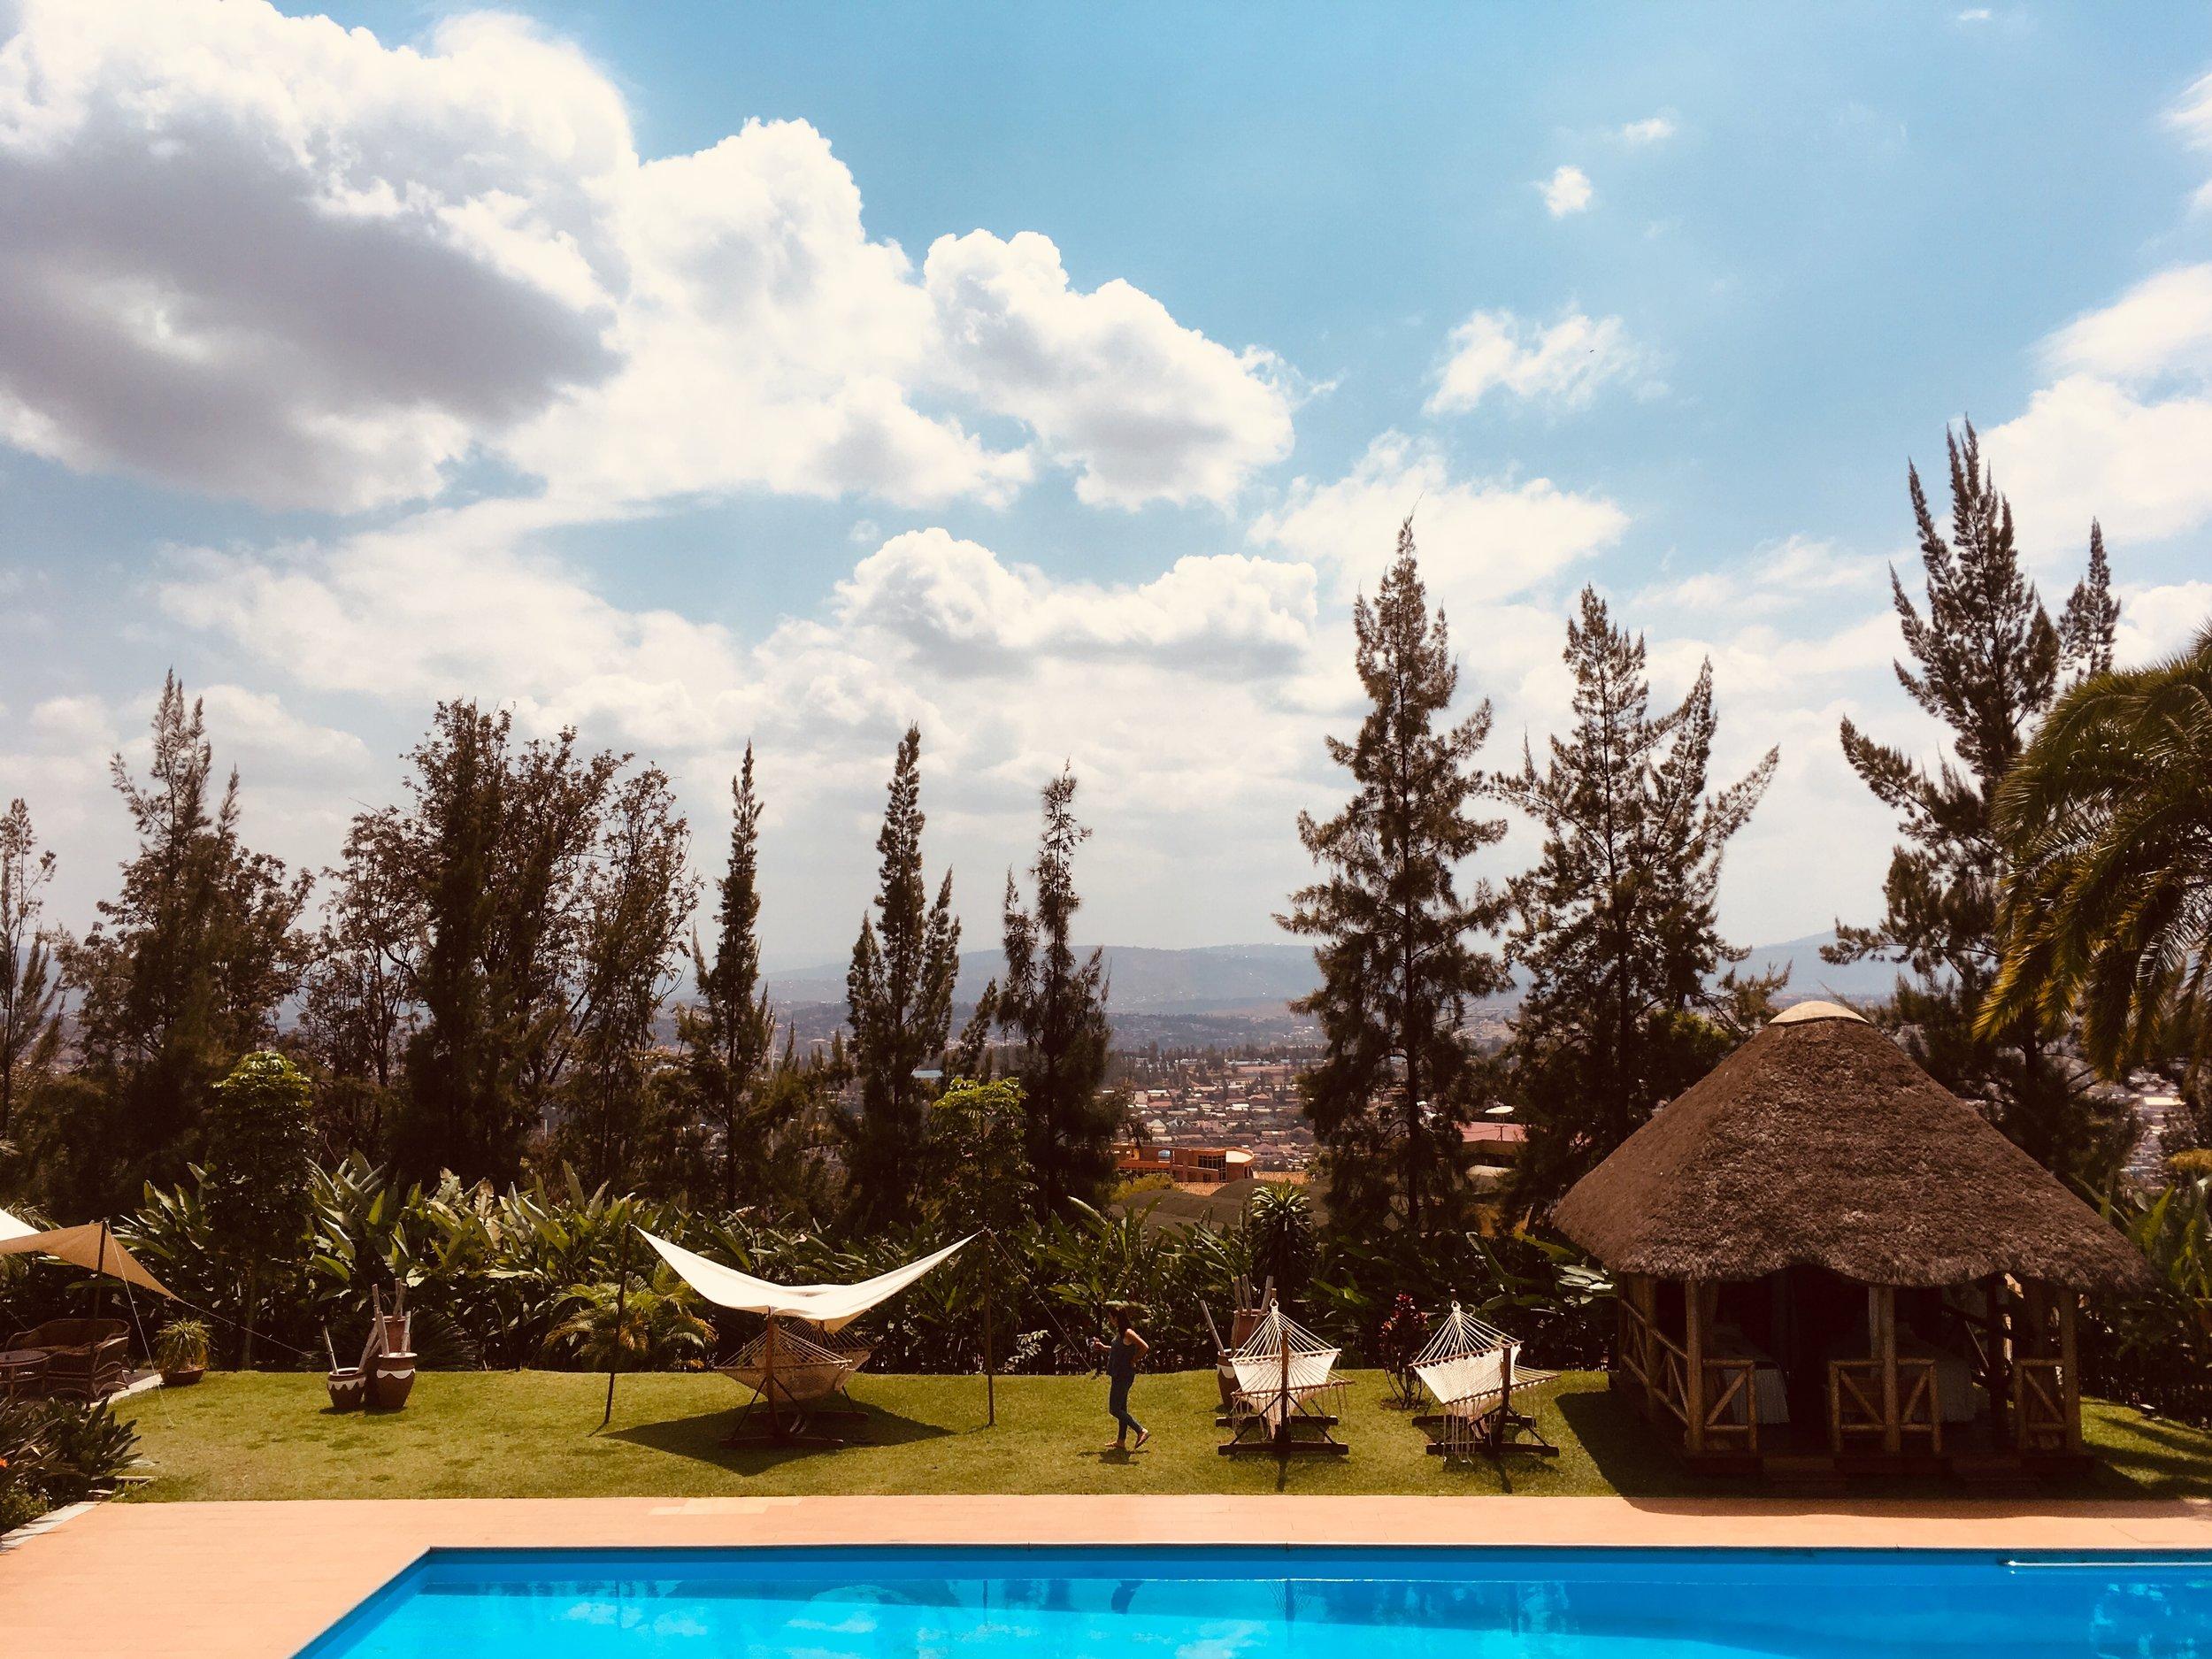 Milles Collines Hotel poolside Kigali